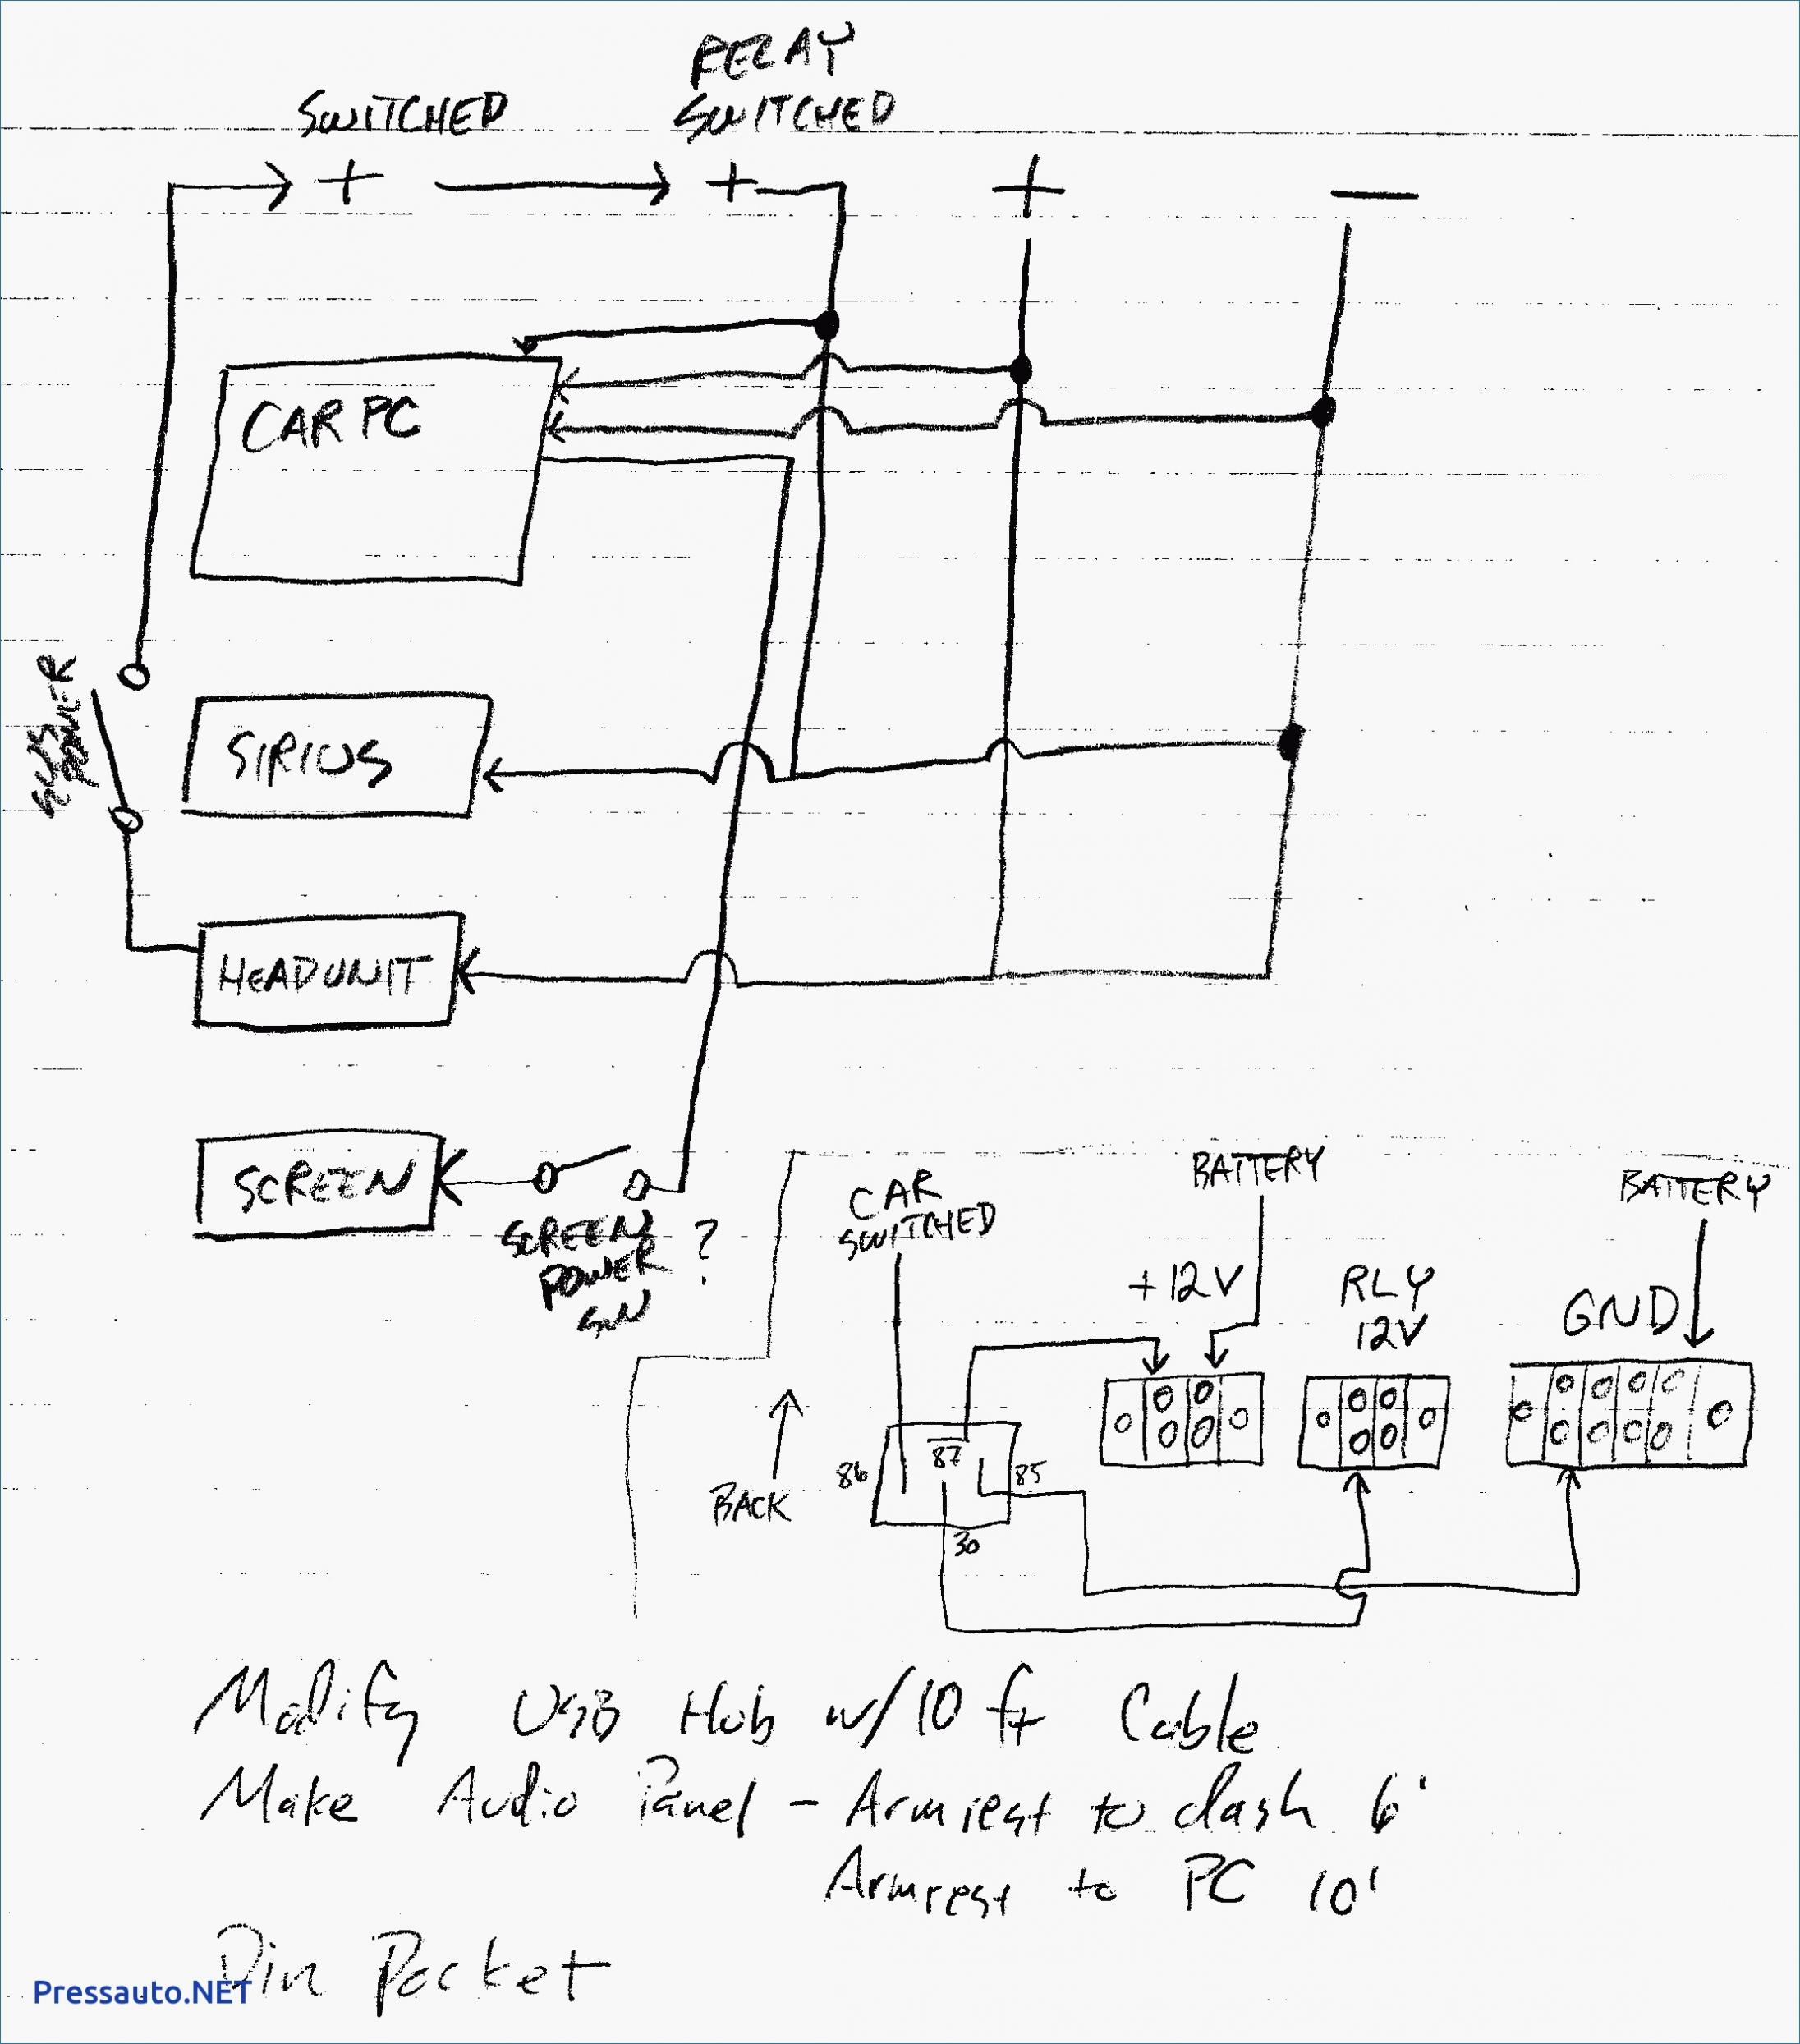 Fisher Snow Plow Wiring Diagram Webtor Best Ideas Western Endear - Western Snow Plow Wiring Diagram